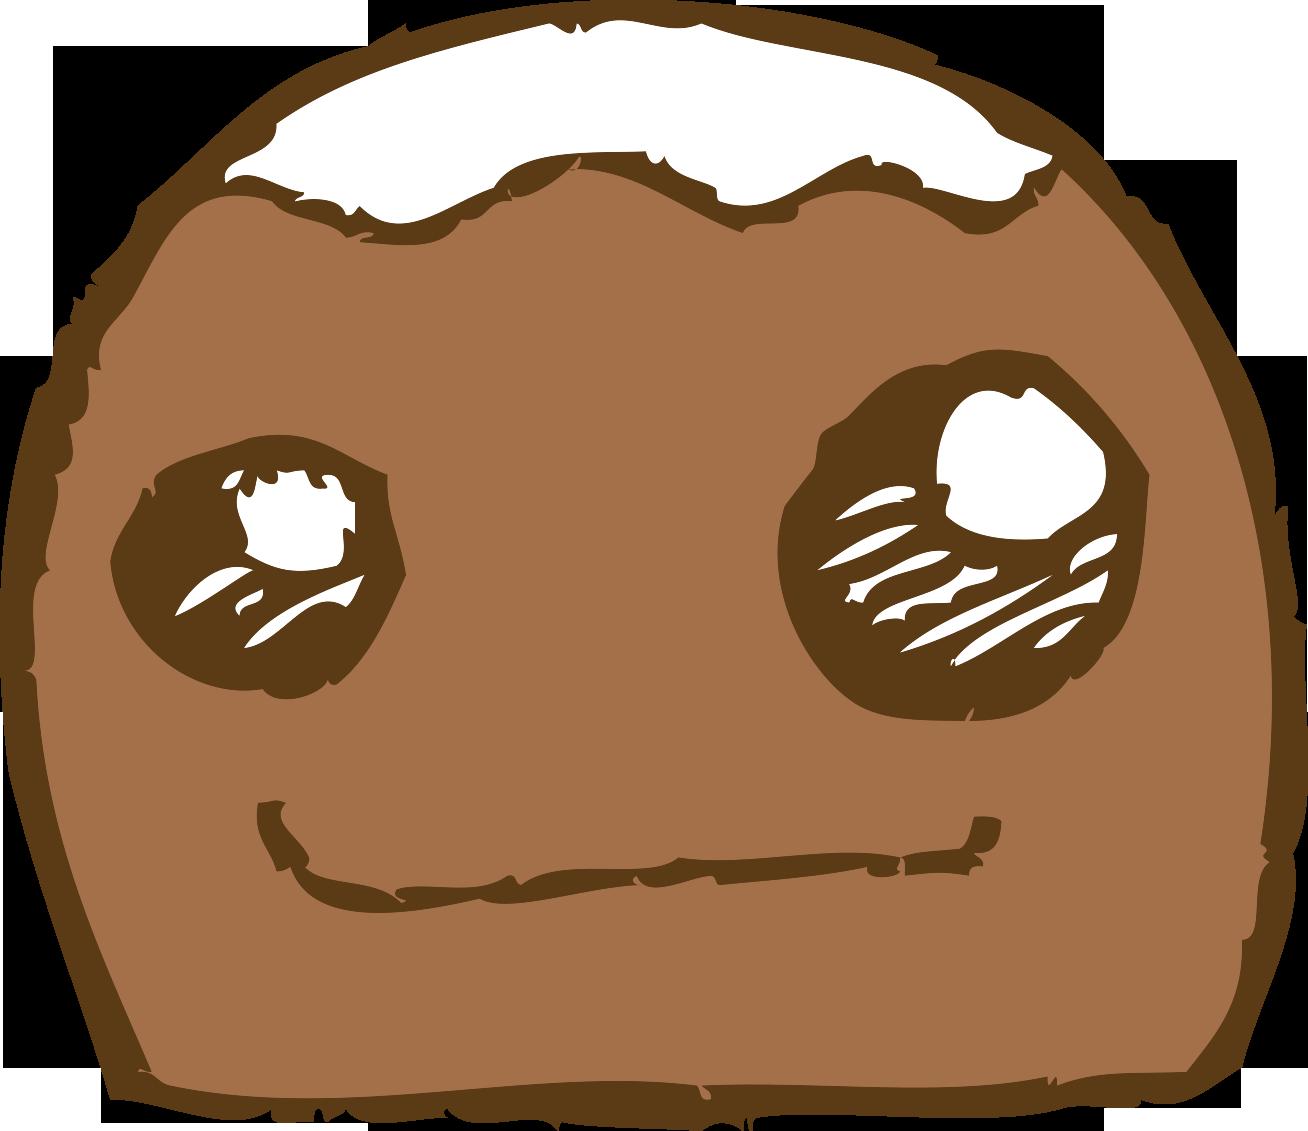 Chocolate bar cartoon clip. Nut clipart bean